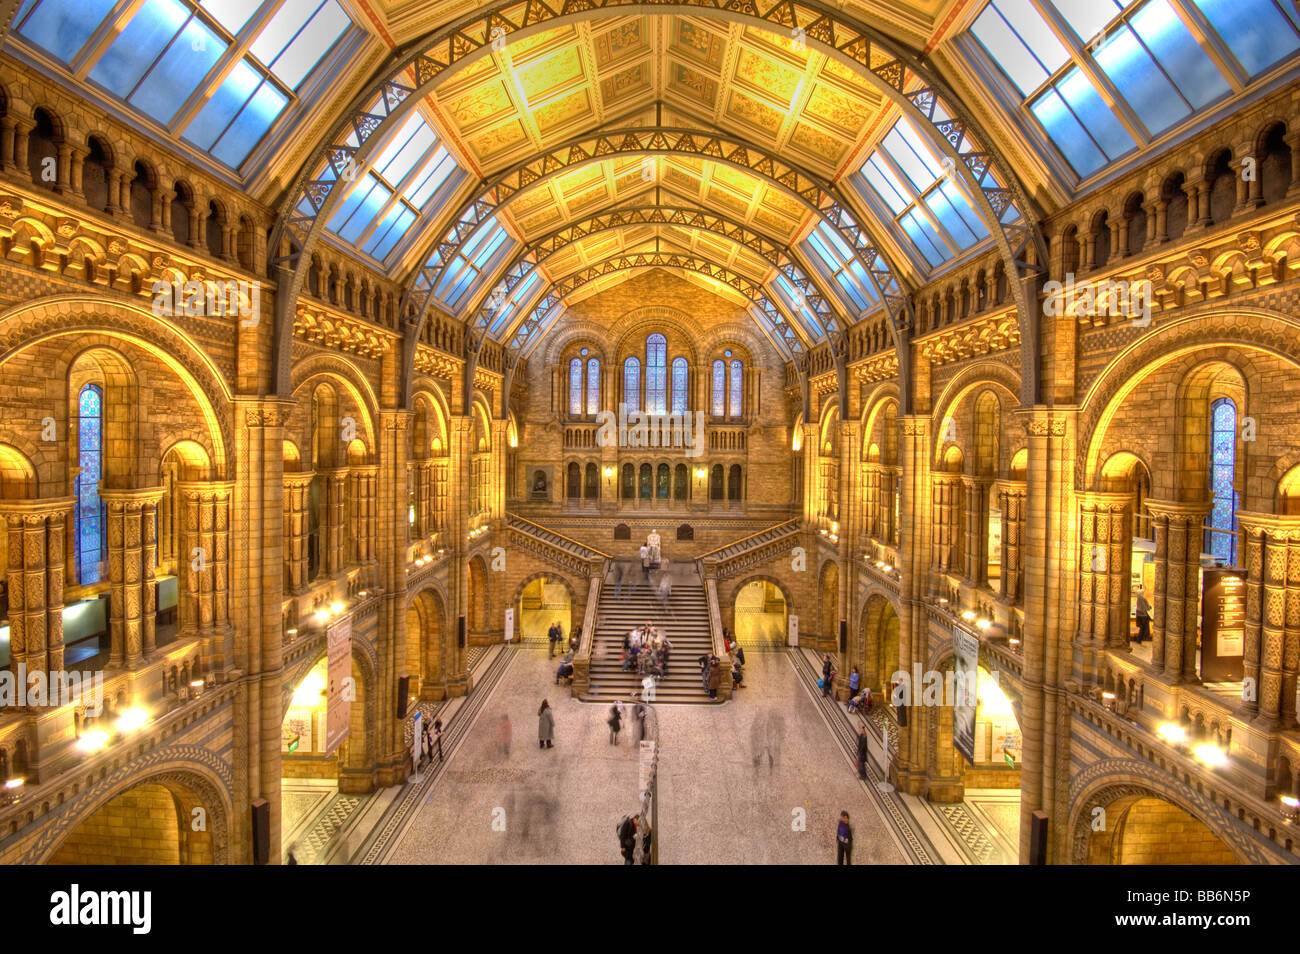 natural history museum london england uk - Stock Image